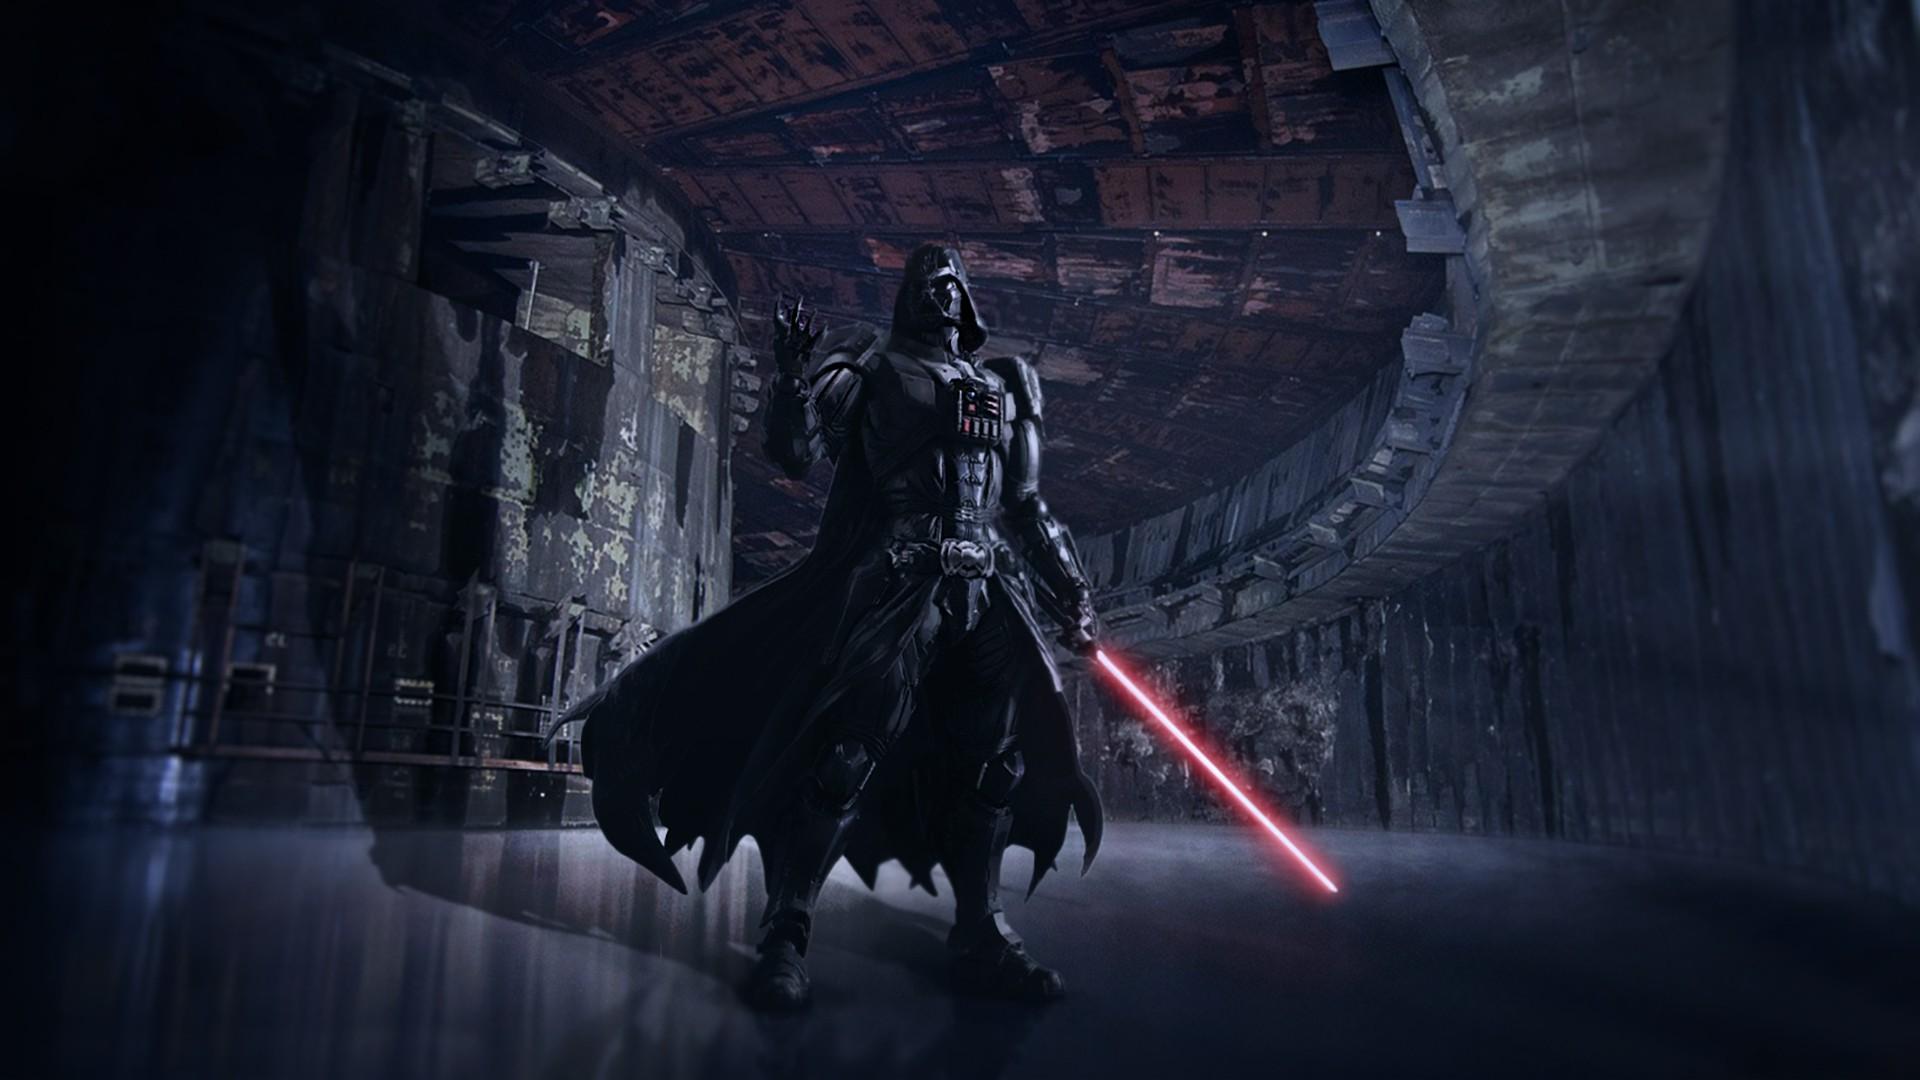 Darth Vader Star Wars Adobe Photoshop Wallpapers Star